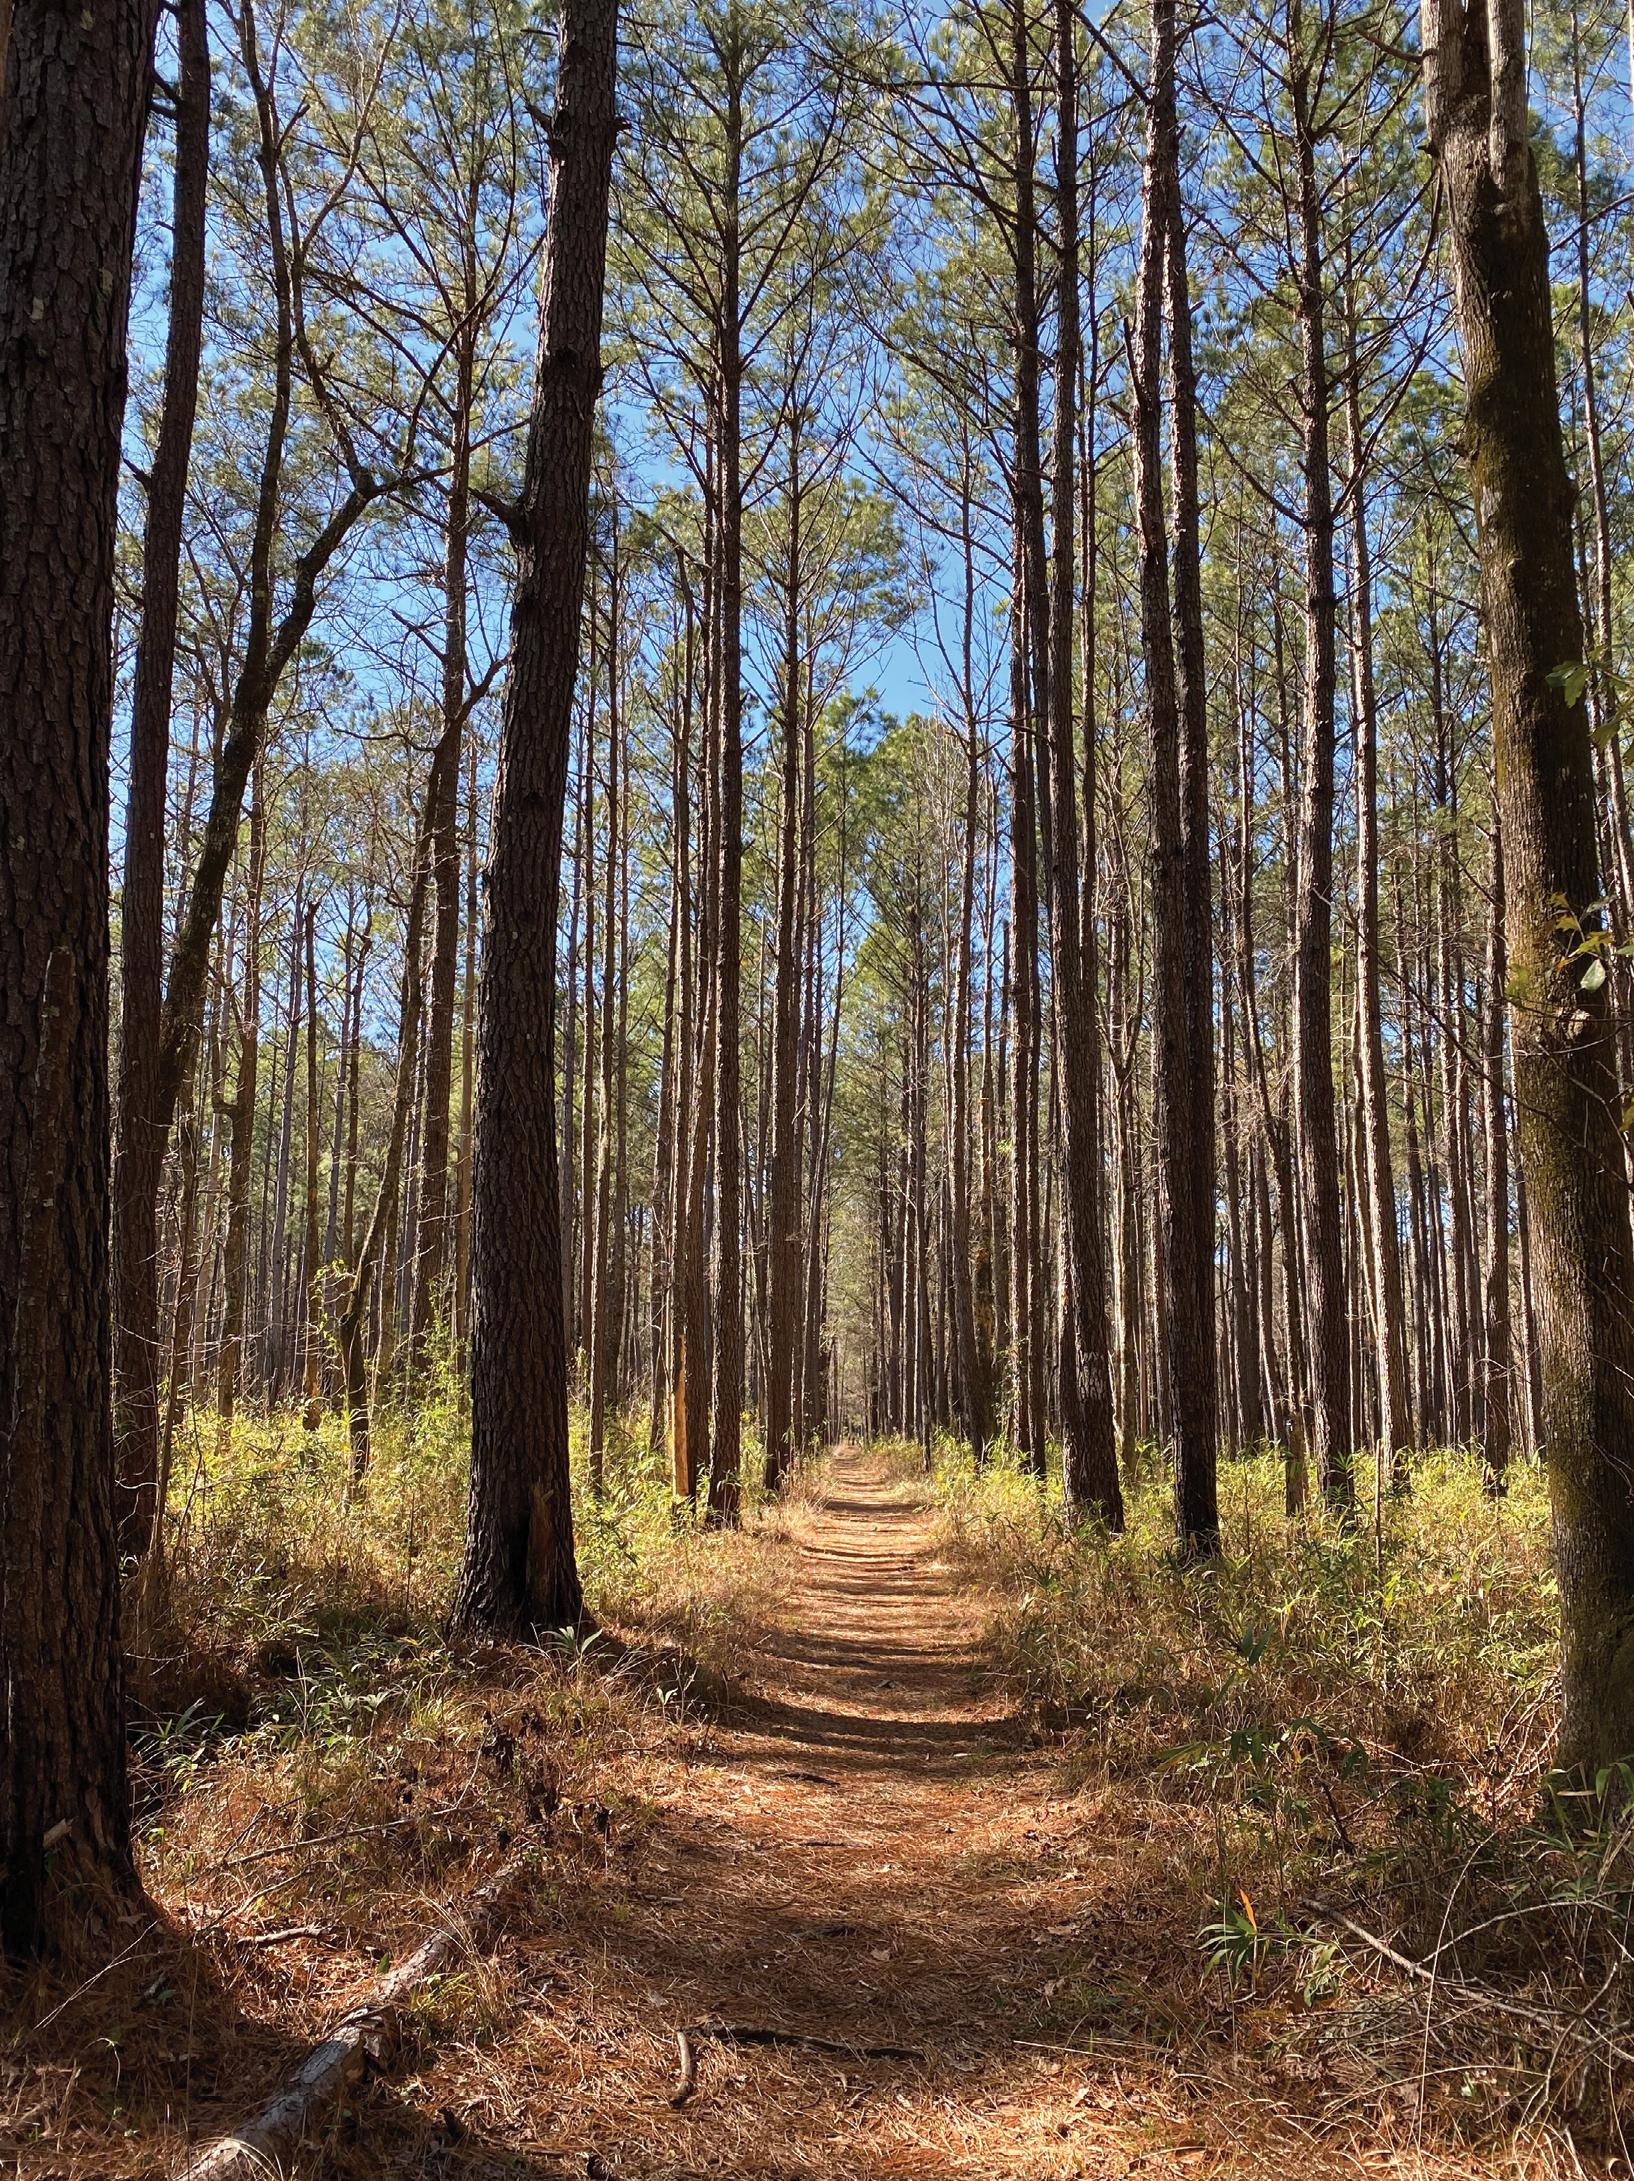 Swamp Fox Passage of the Palmetto Trail